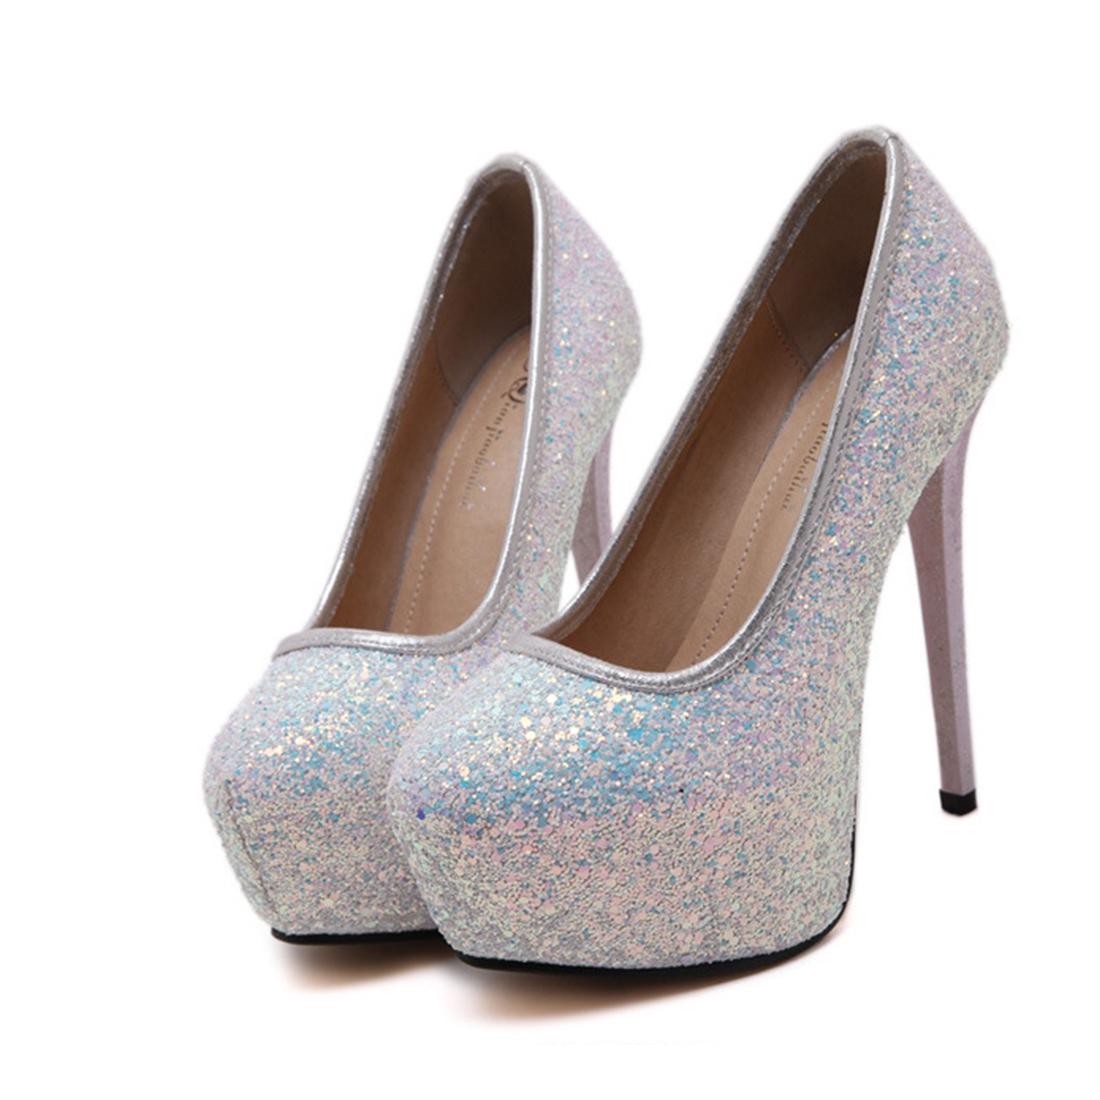 Aliexpress De Chaussure Mariage De Mariage Chaussure Aliexpress De Aliexpress Chaussure oCdeBx